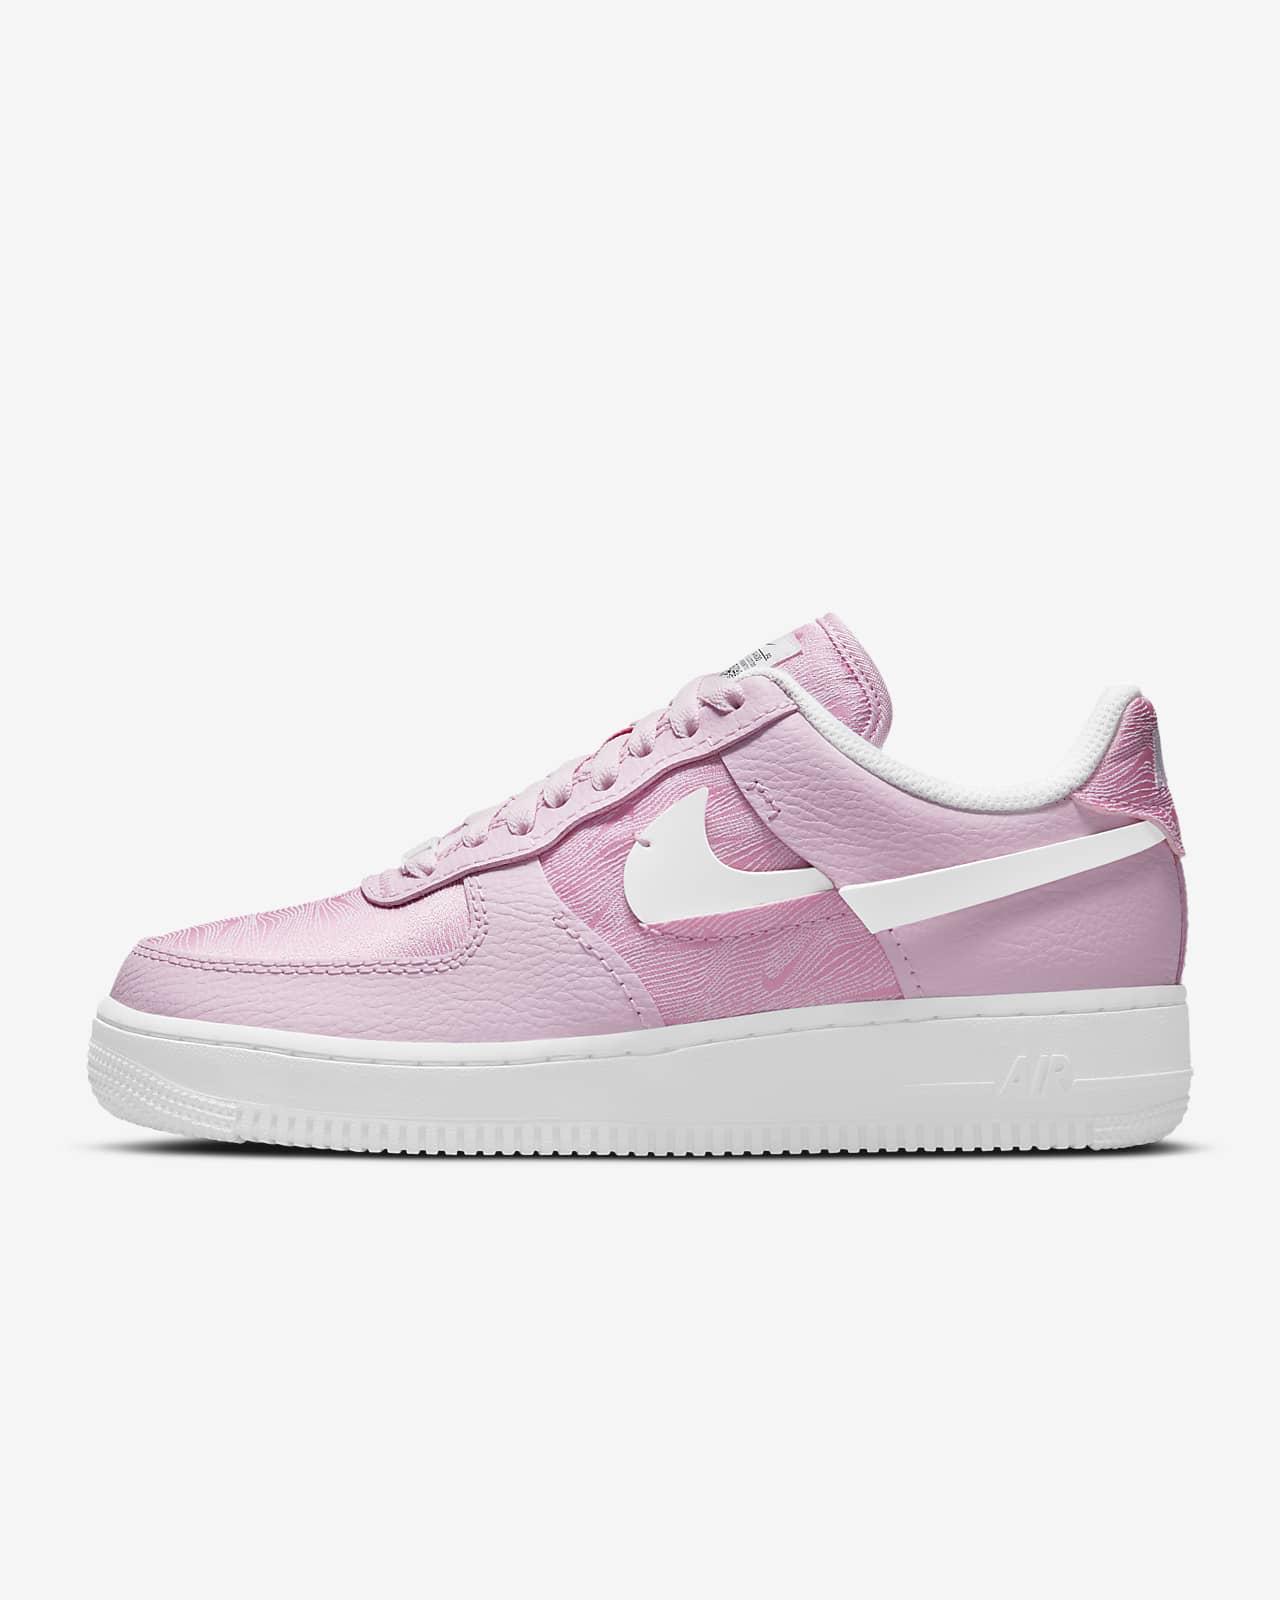 Chaussure Nike Air Force 1 LXX pour Femme